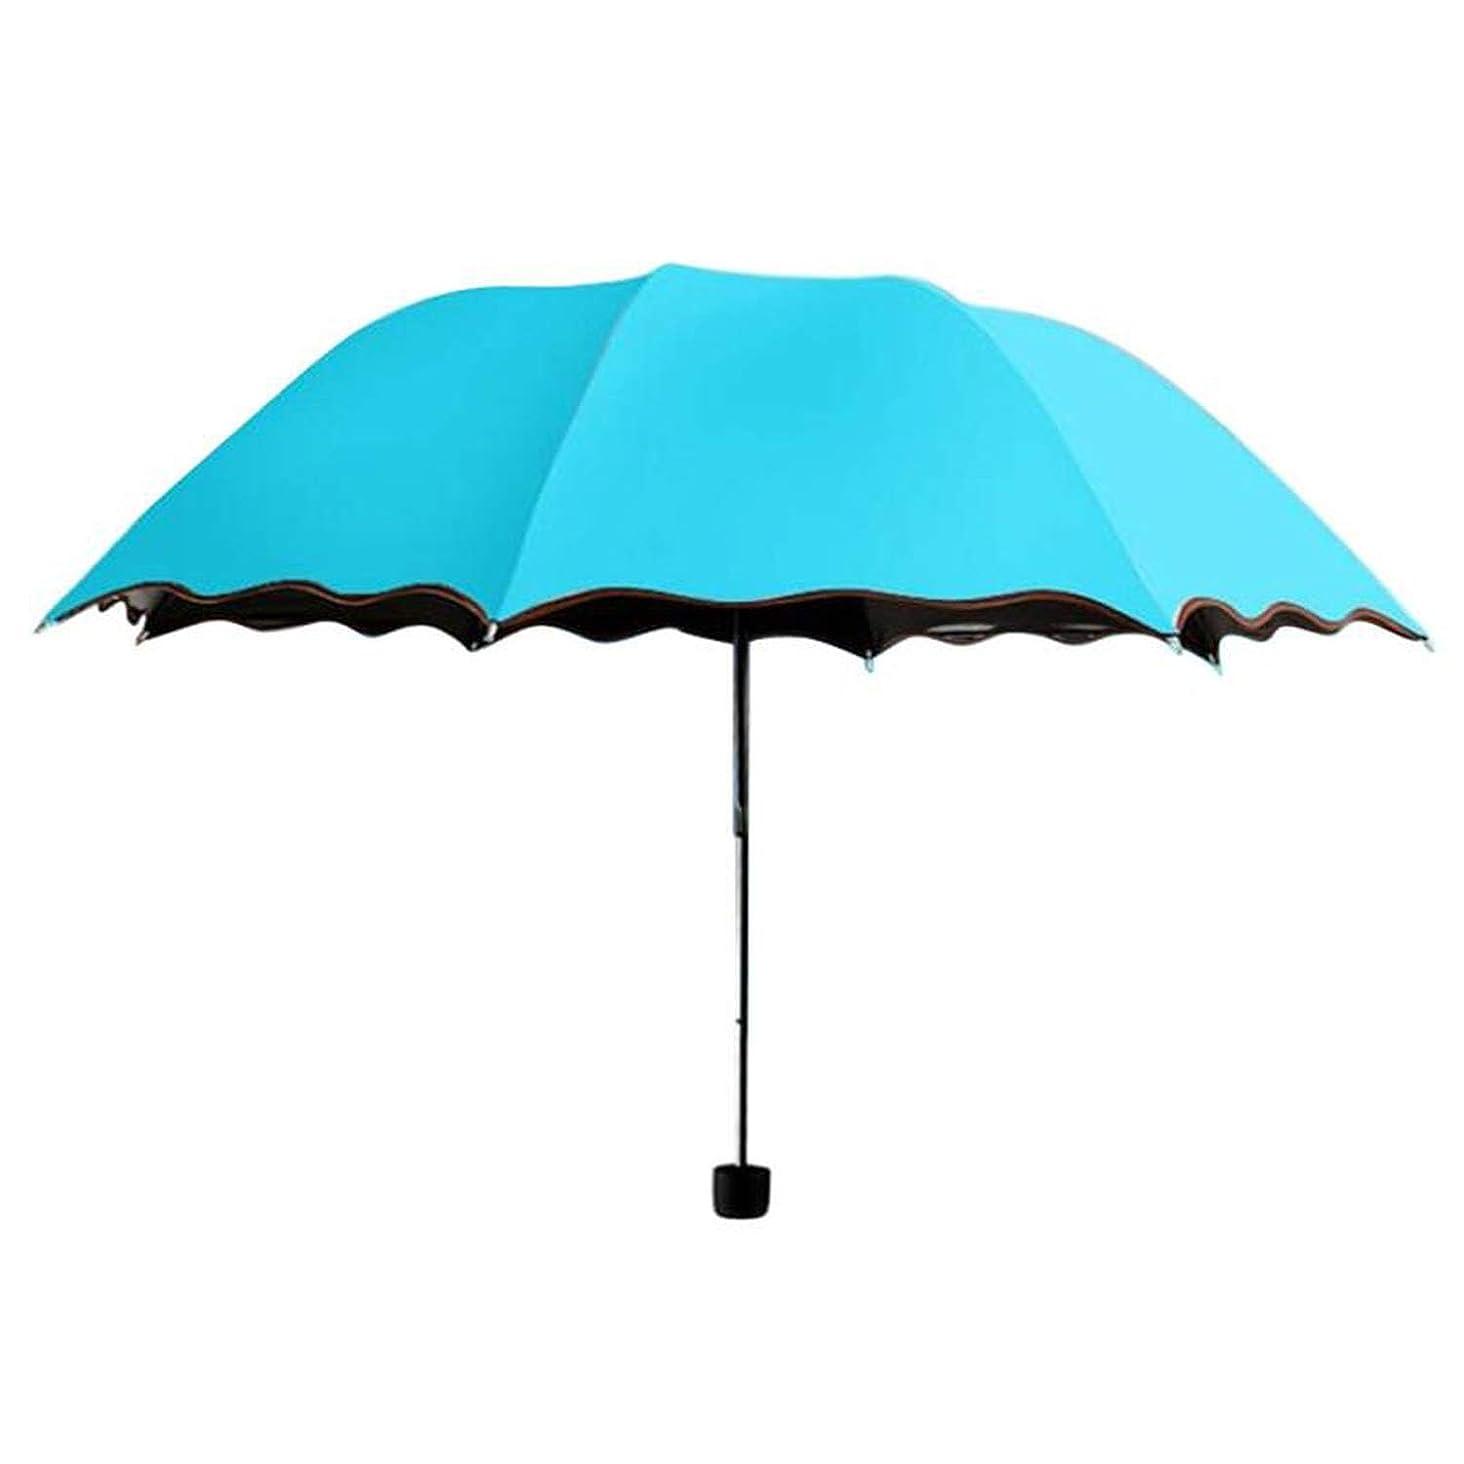 Wind Resistant Folding Travel Parasol Folding Rain Windproof Umbrella Folding Anti-UV Sun/Rain Umbrella,Blue